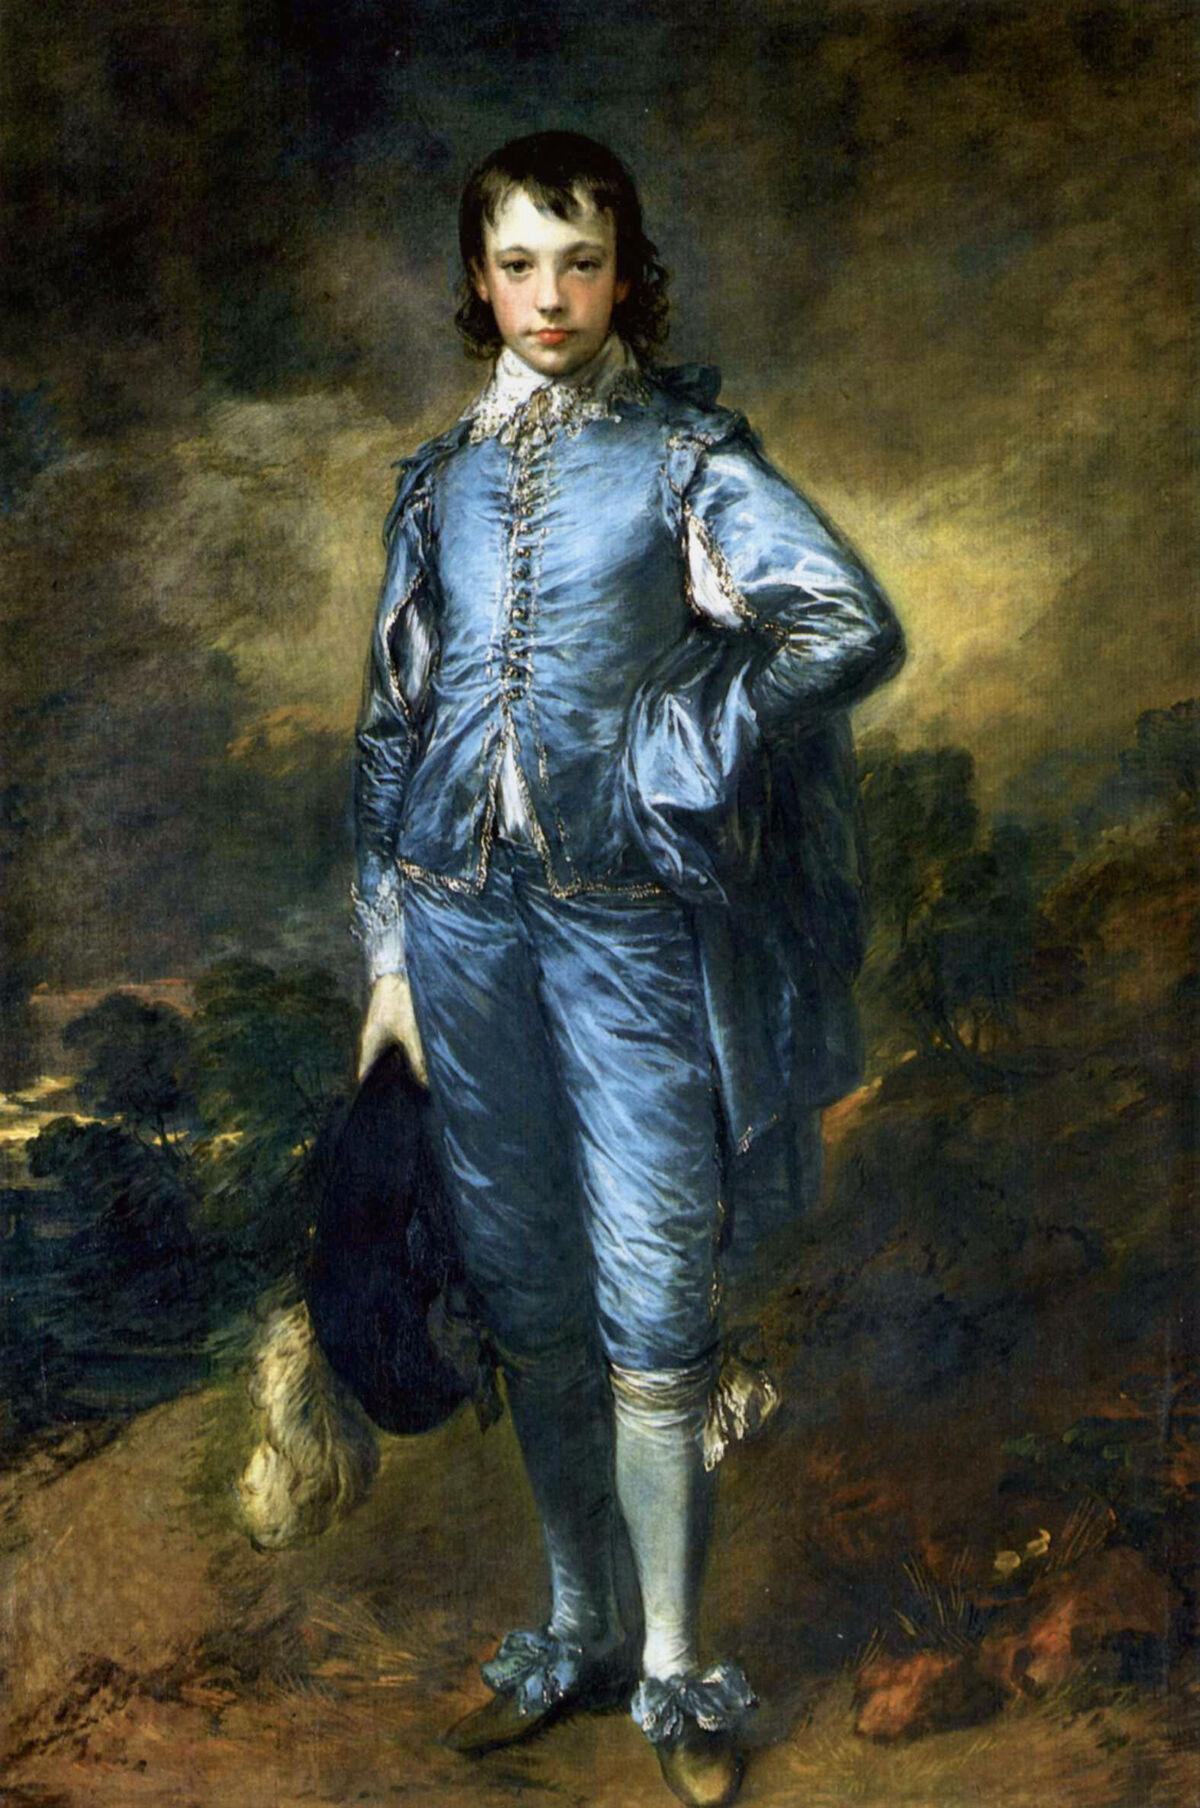 Thomas Gainsborough, The Blue Boy, Portrait of Jonathan Buttall, ca. 1770. Image via Wikimedia Commons.